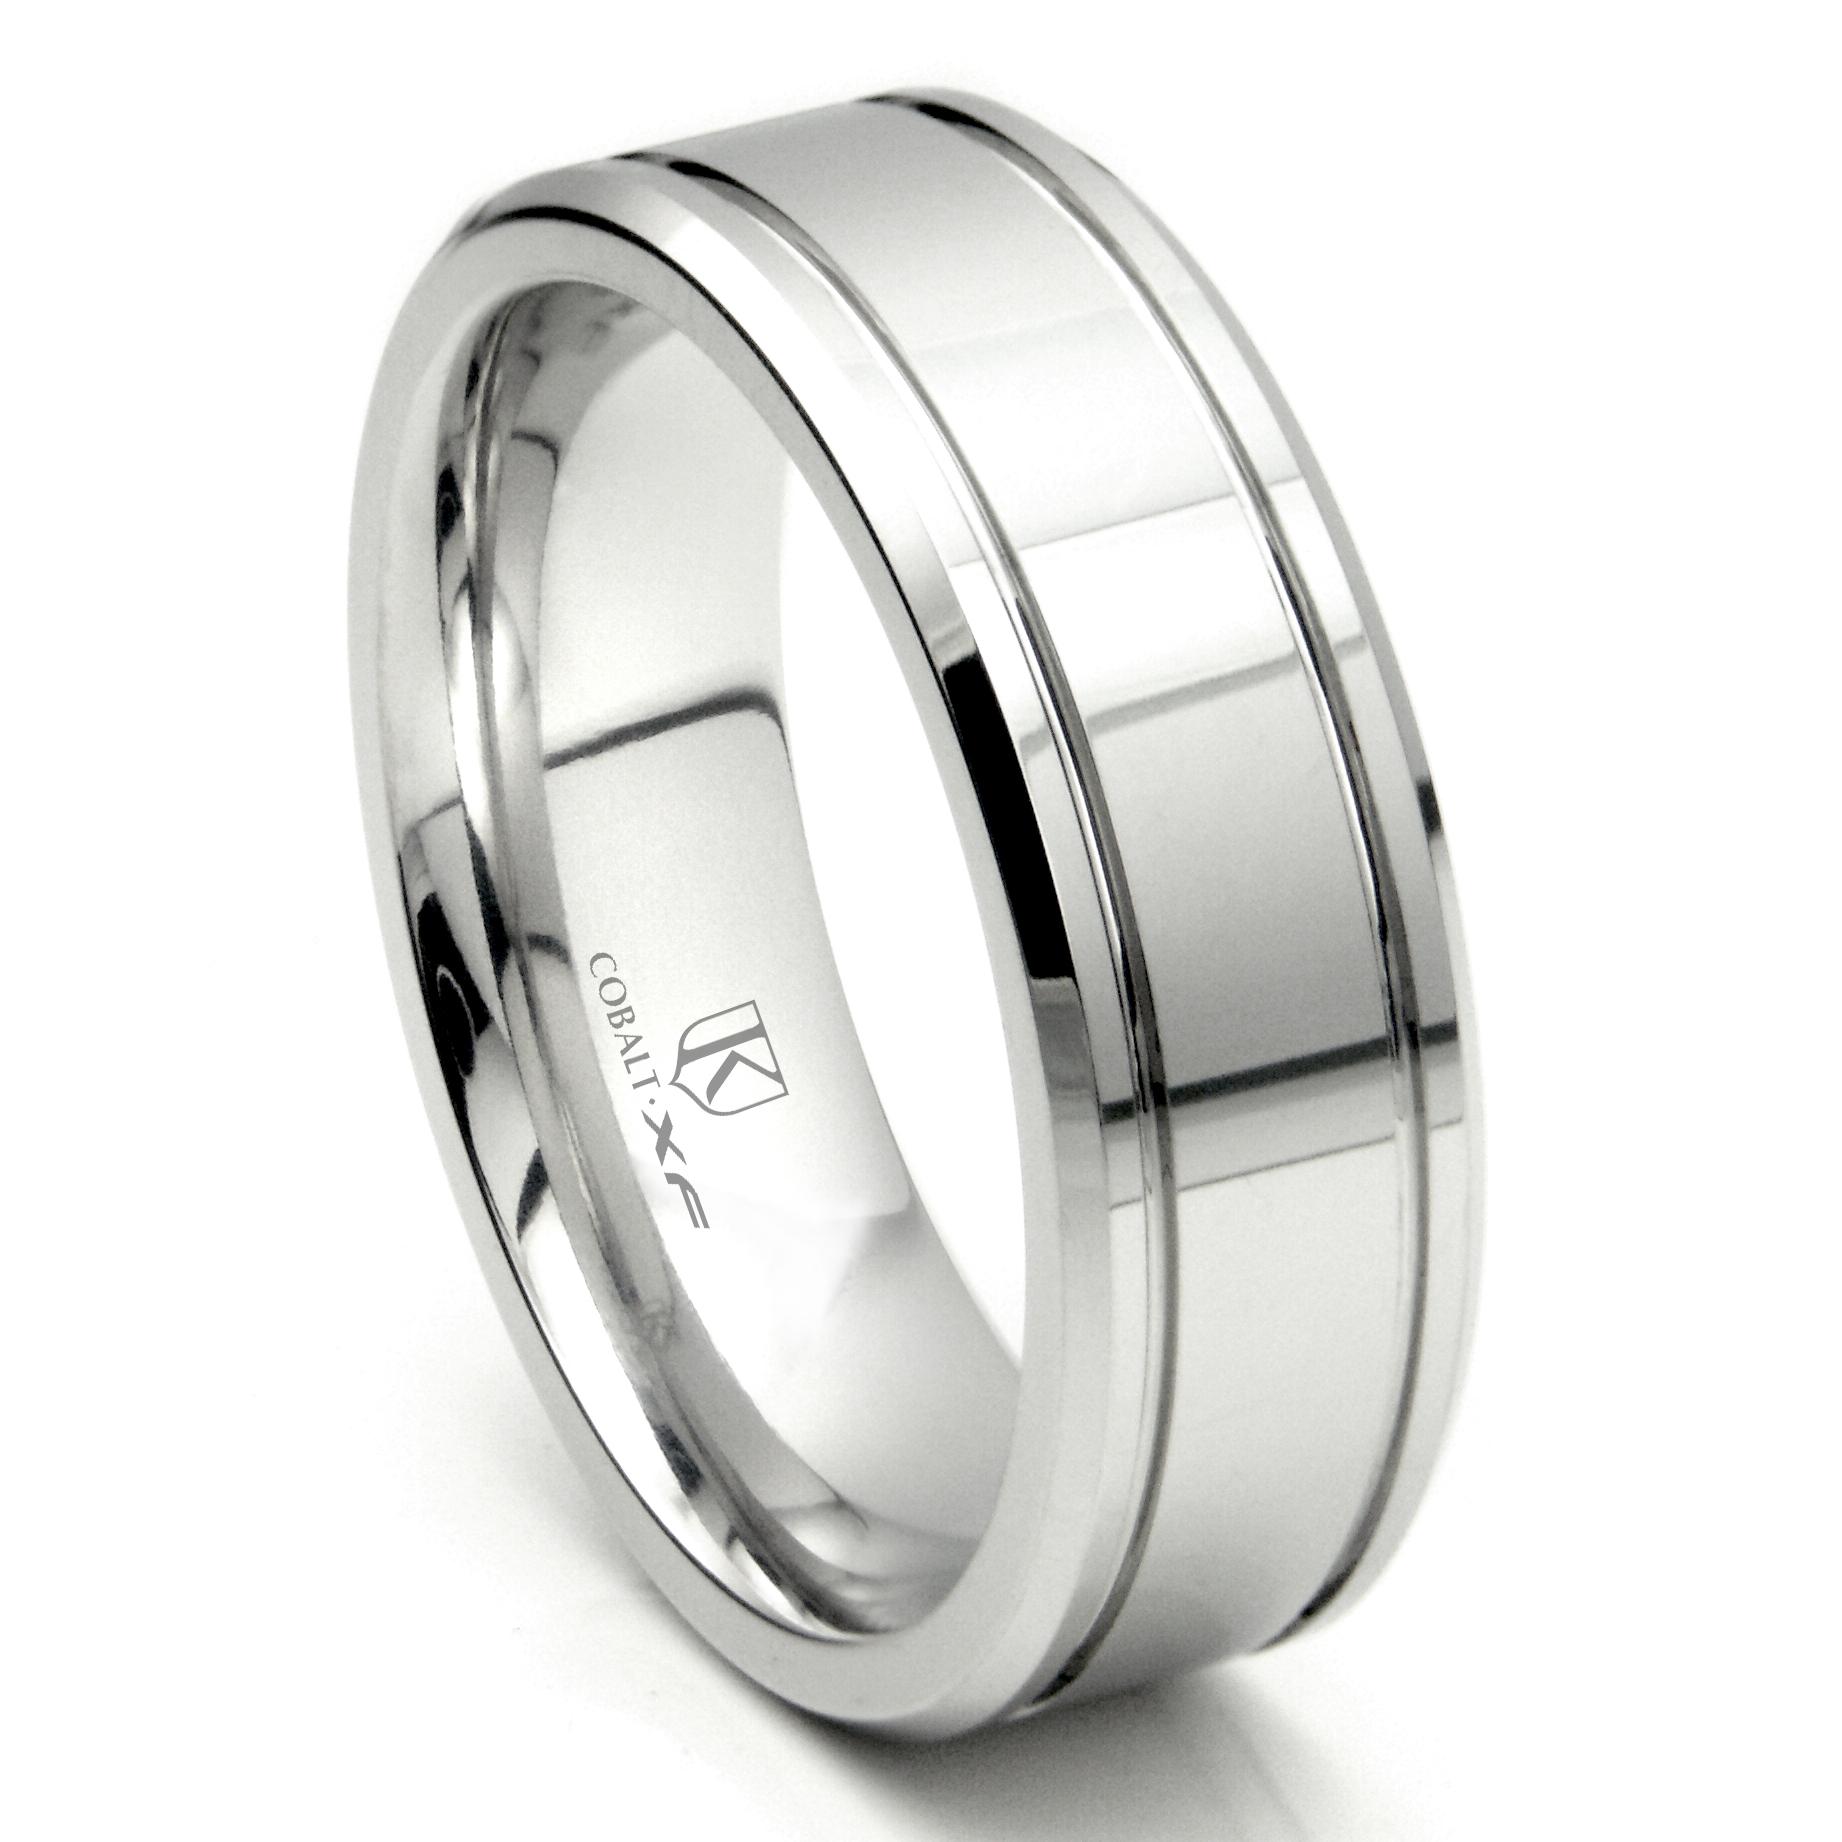 Cobalt XF Chrome 8MM Double Groove High Polish Wedding Band Ring P cobalt wedding bands Home Cobalt Rings Loading zoom